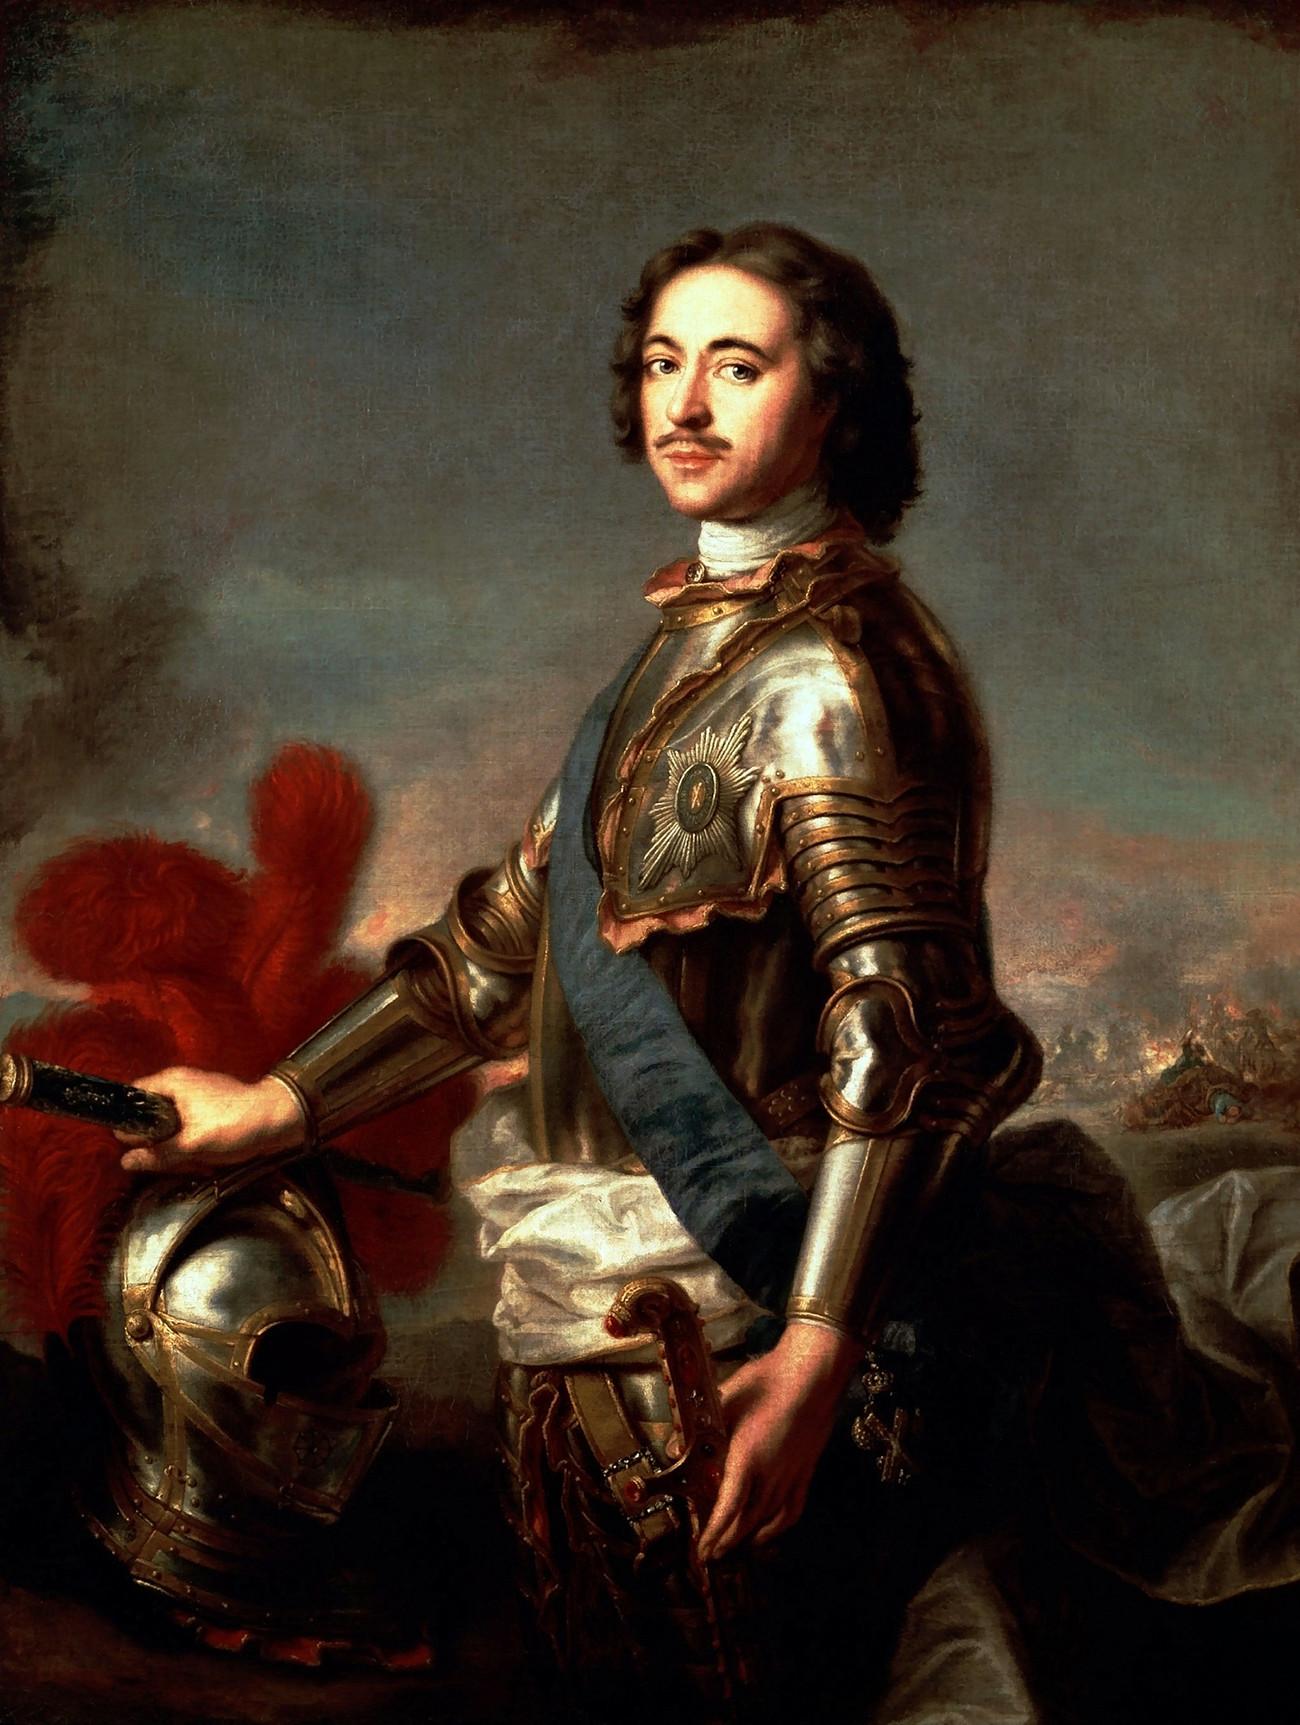 Pyotr yang Agung oleh Jean-Marc Nattier, 1717.